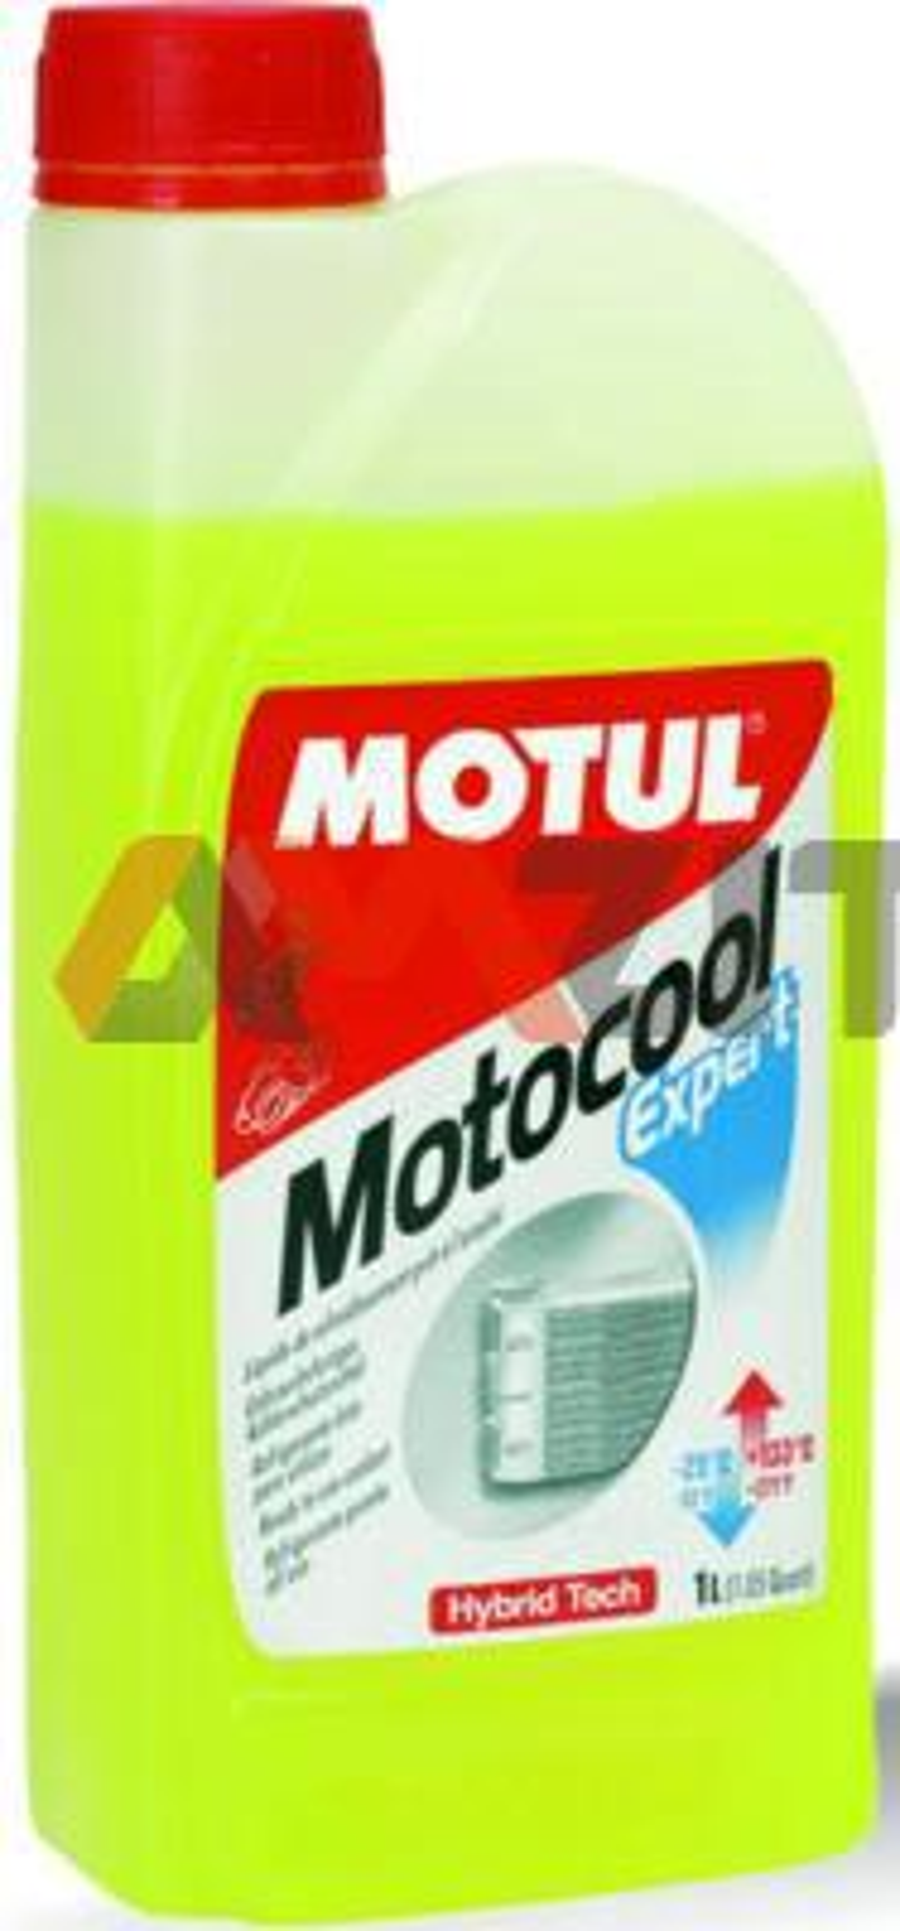 "Антифриз ""Motul Motocool Expert -25"", 1л."